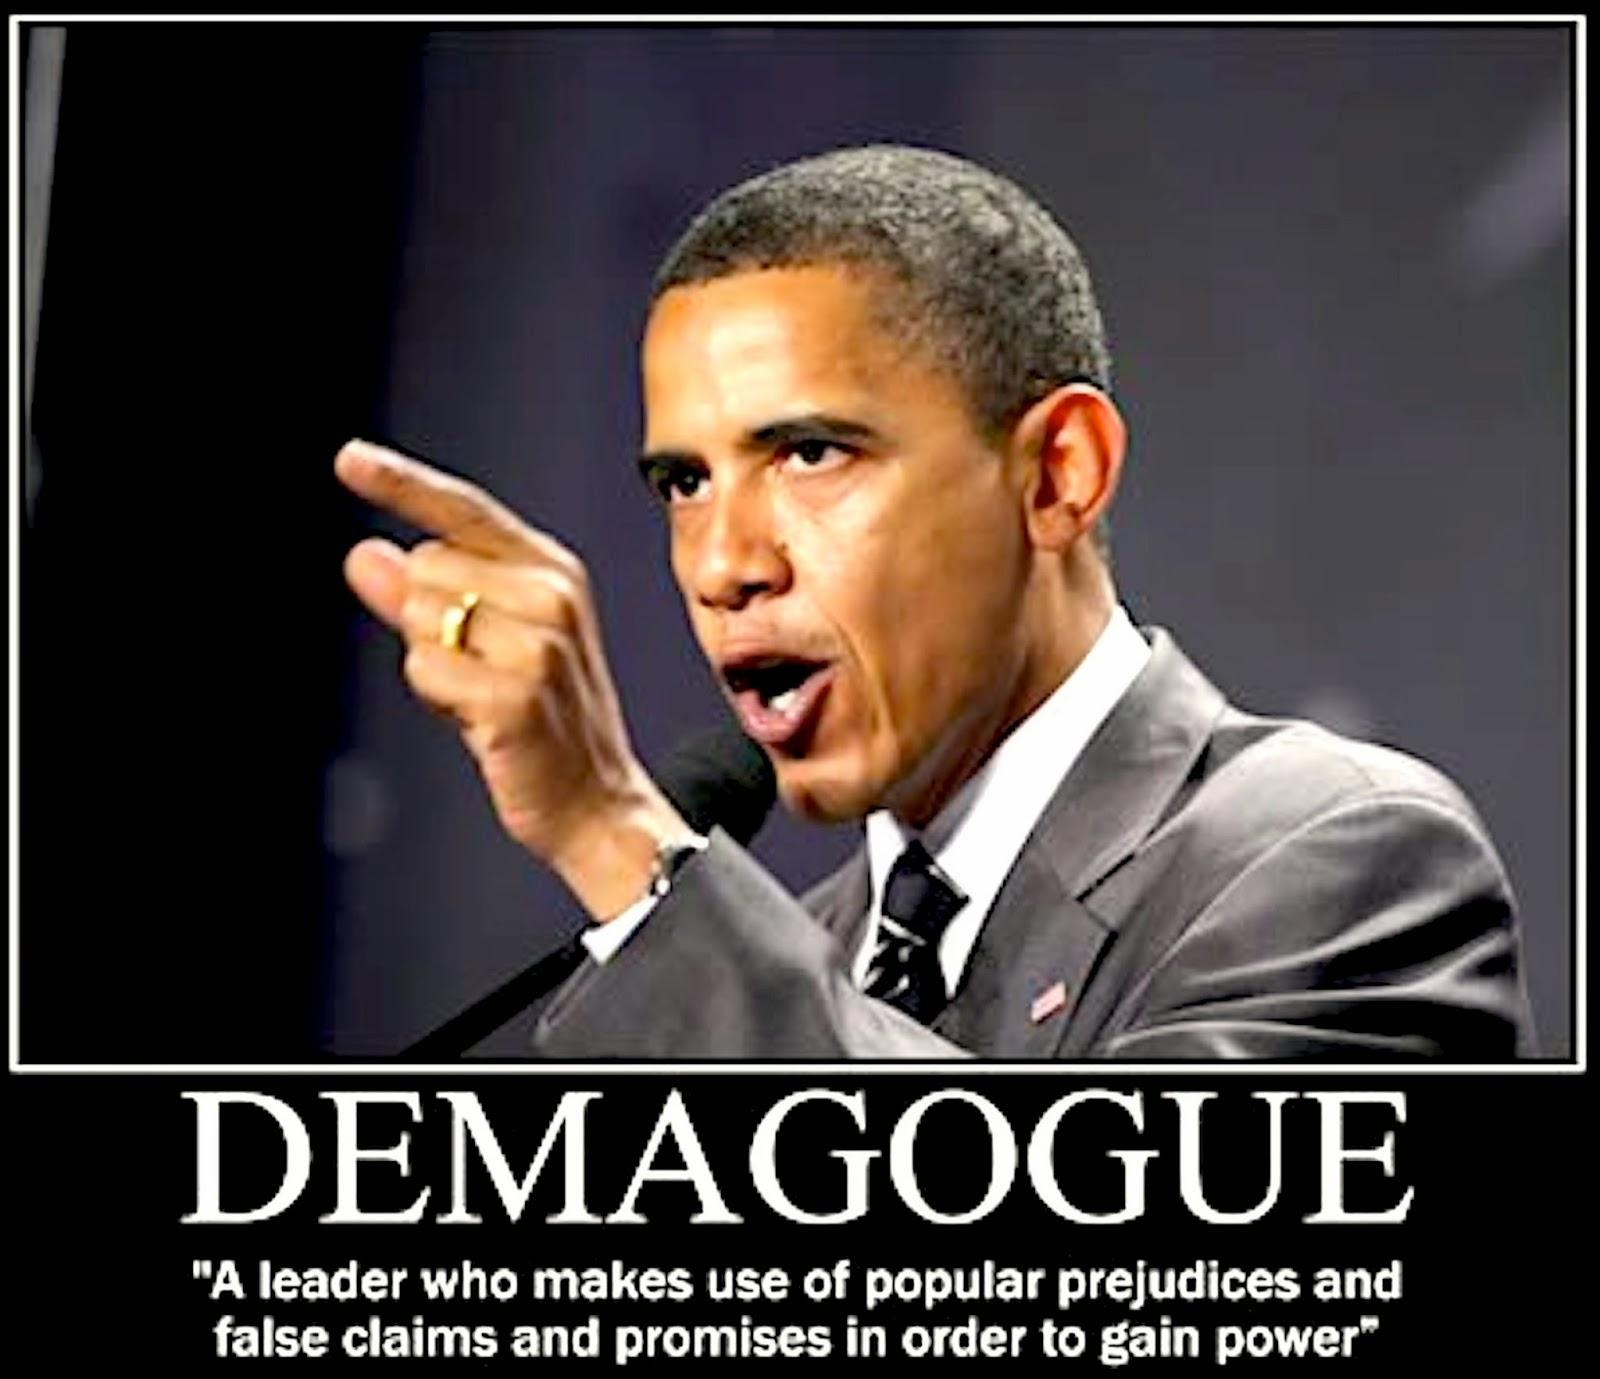 Demagogue meaning in malayalam demagogue in malayalam malayalam